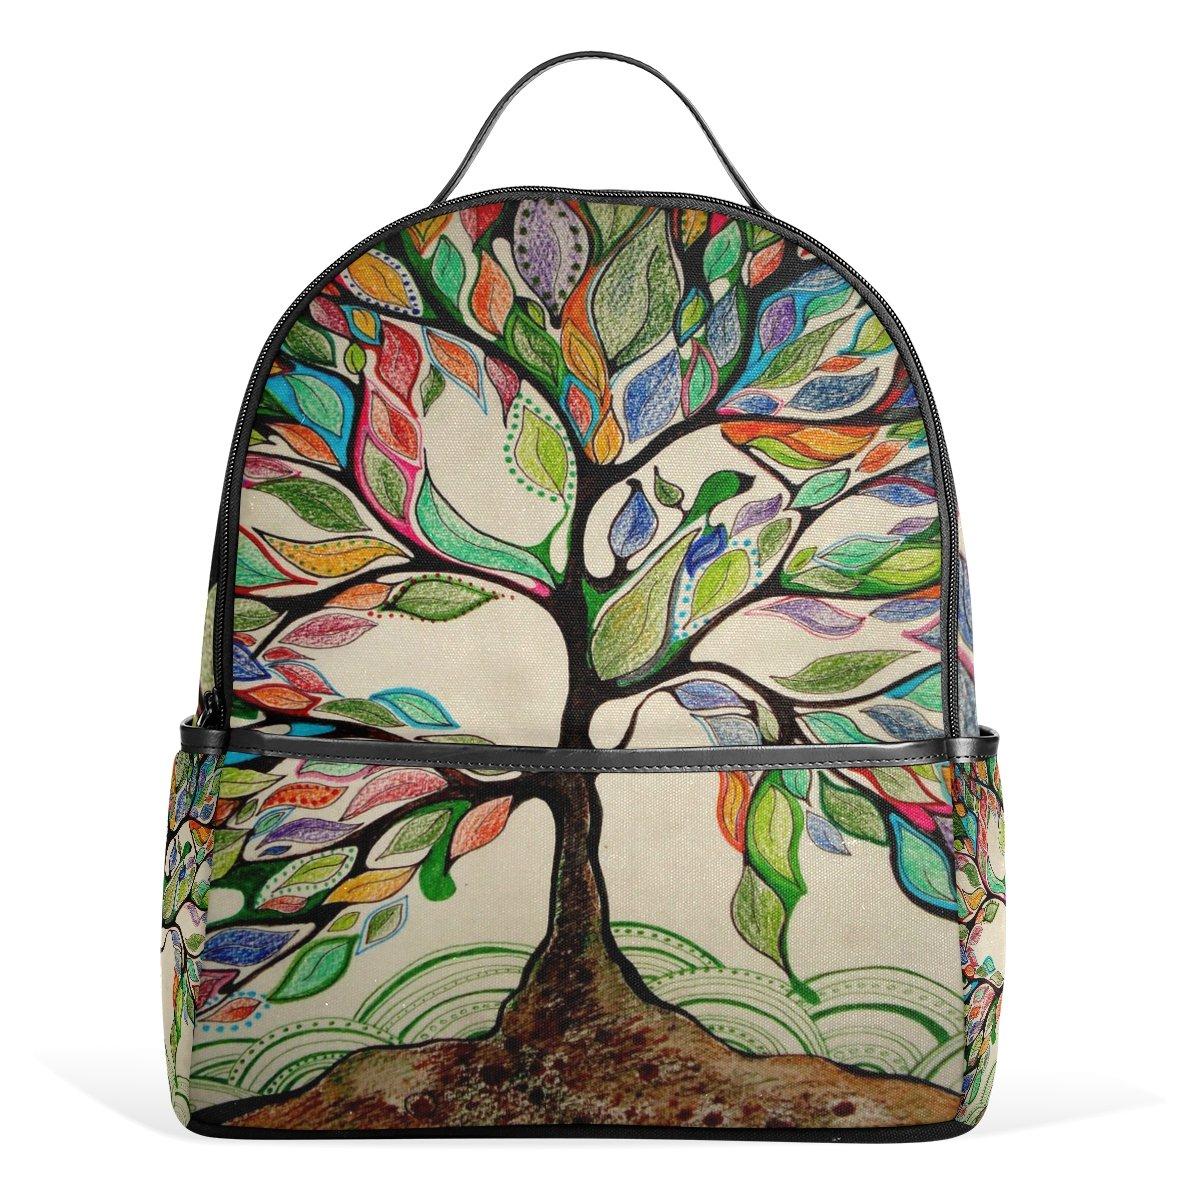 Amazon.com: ALAZA Rucksack Canvas School Satchel Casual Daypack Backpack,Art Tree of Life: Computers & Accessories